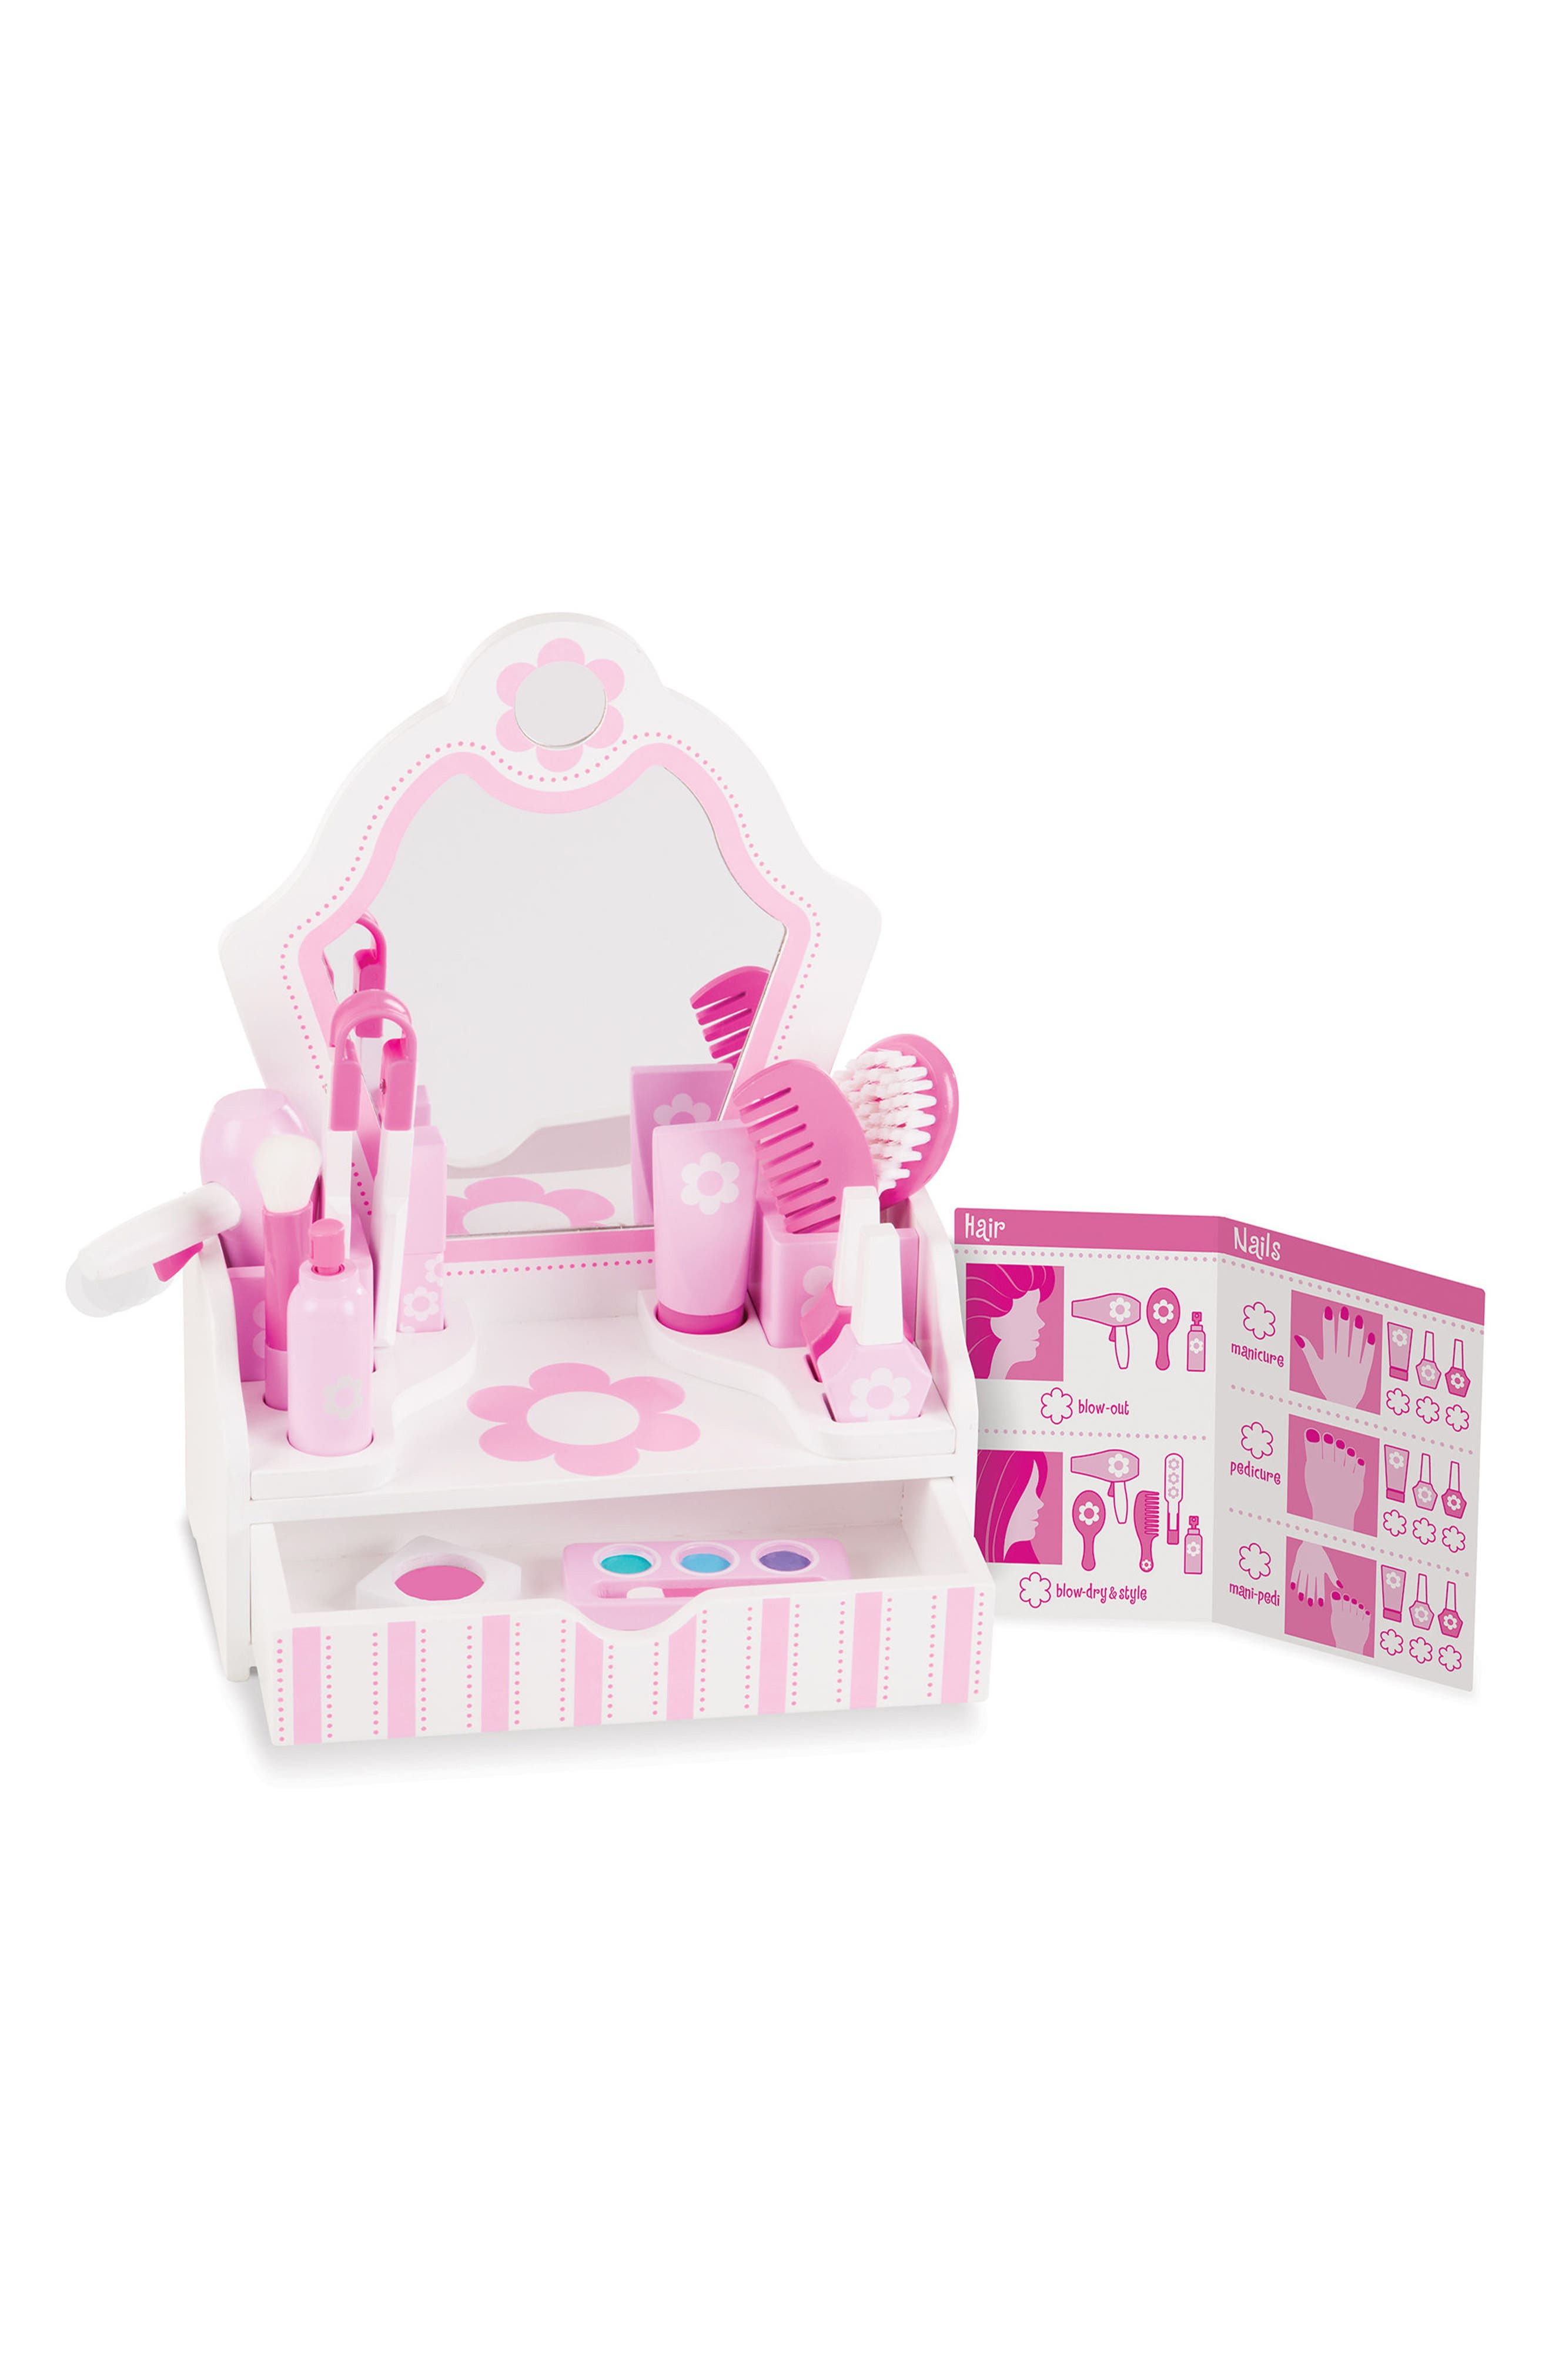 Vanity Play Set,                         Main,                         color, PINK MULTI